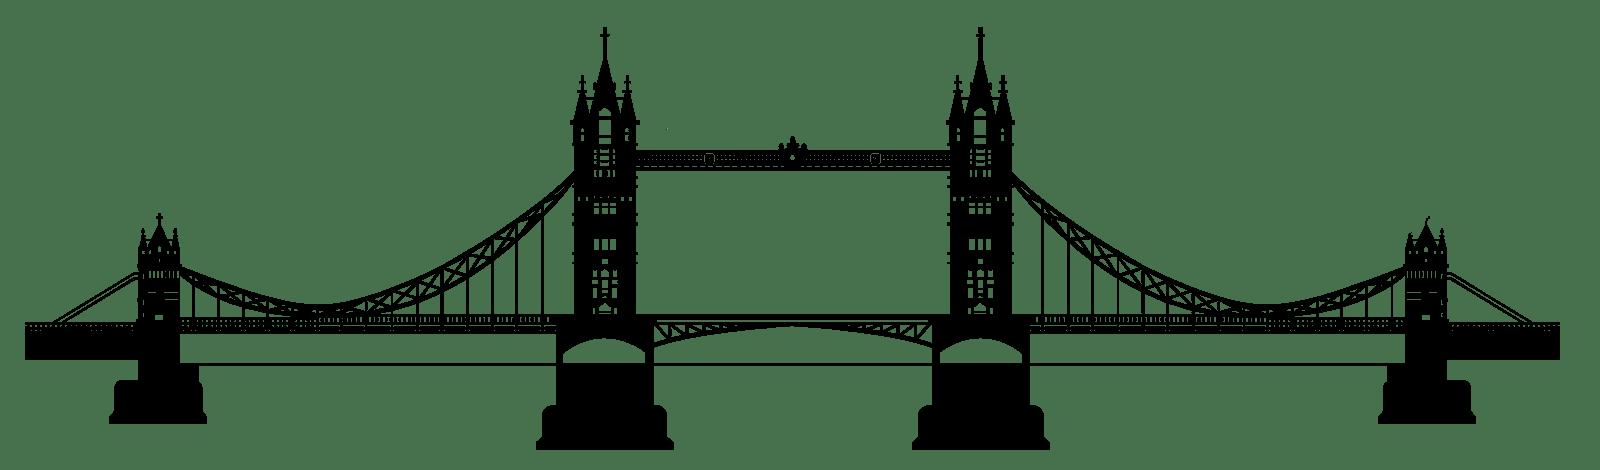 Tower Bridge Clipart Transparent Png Stickpng